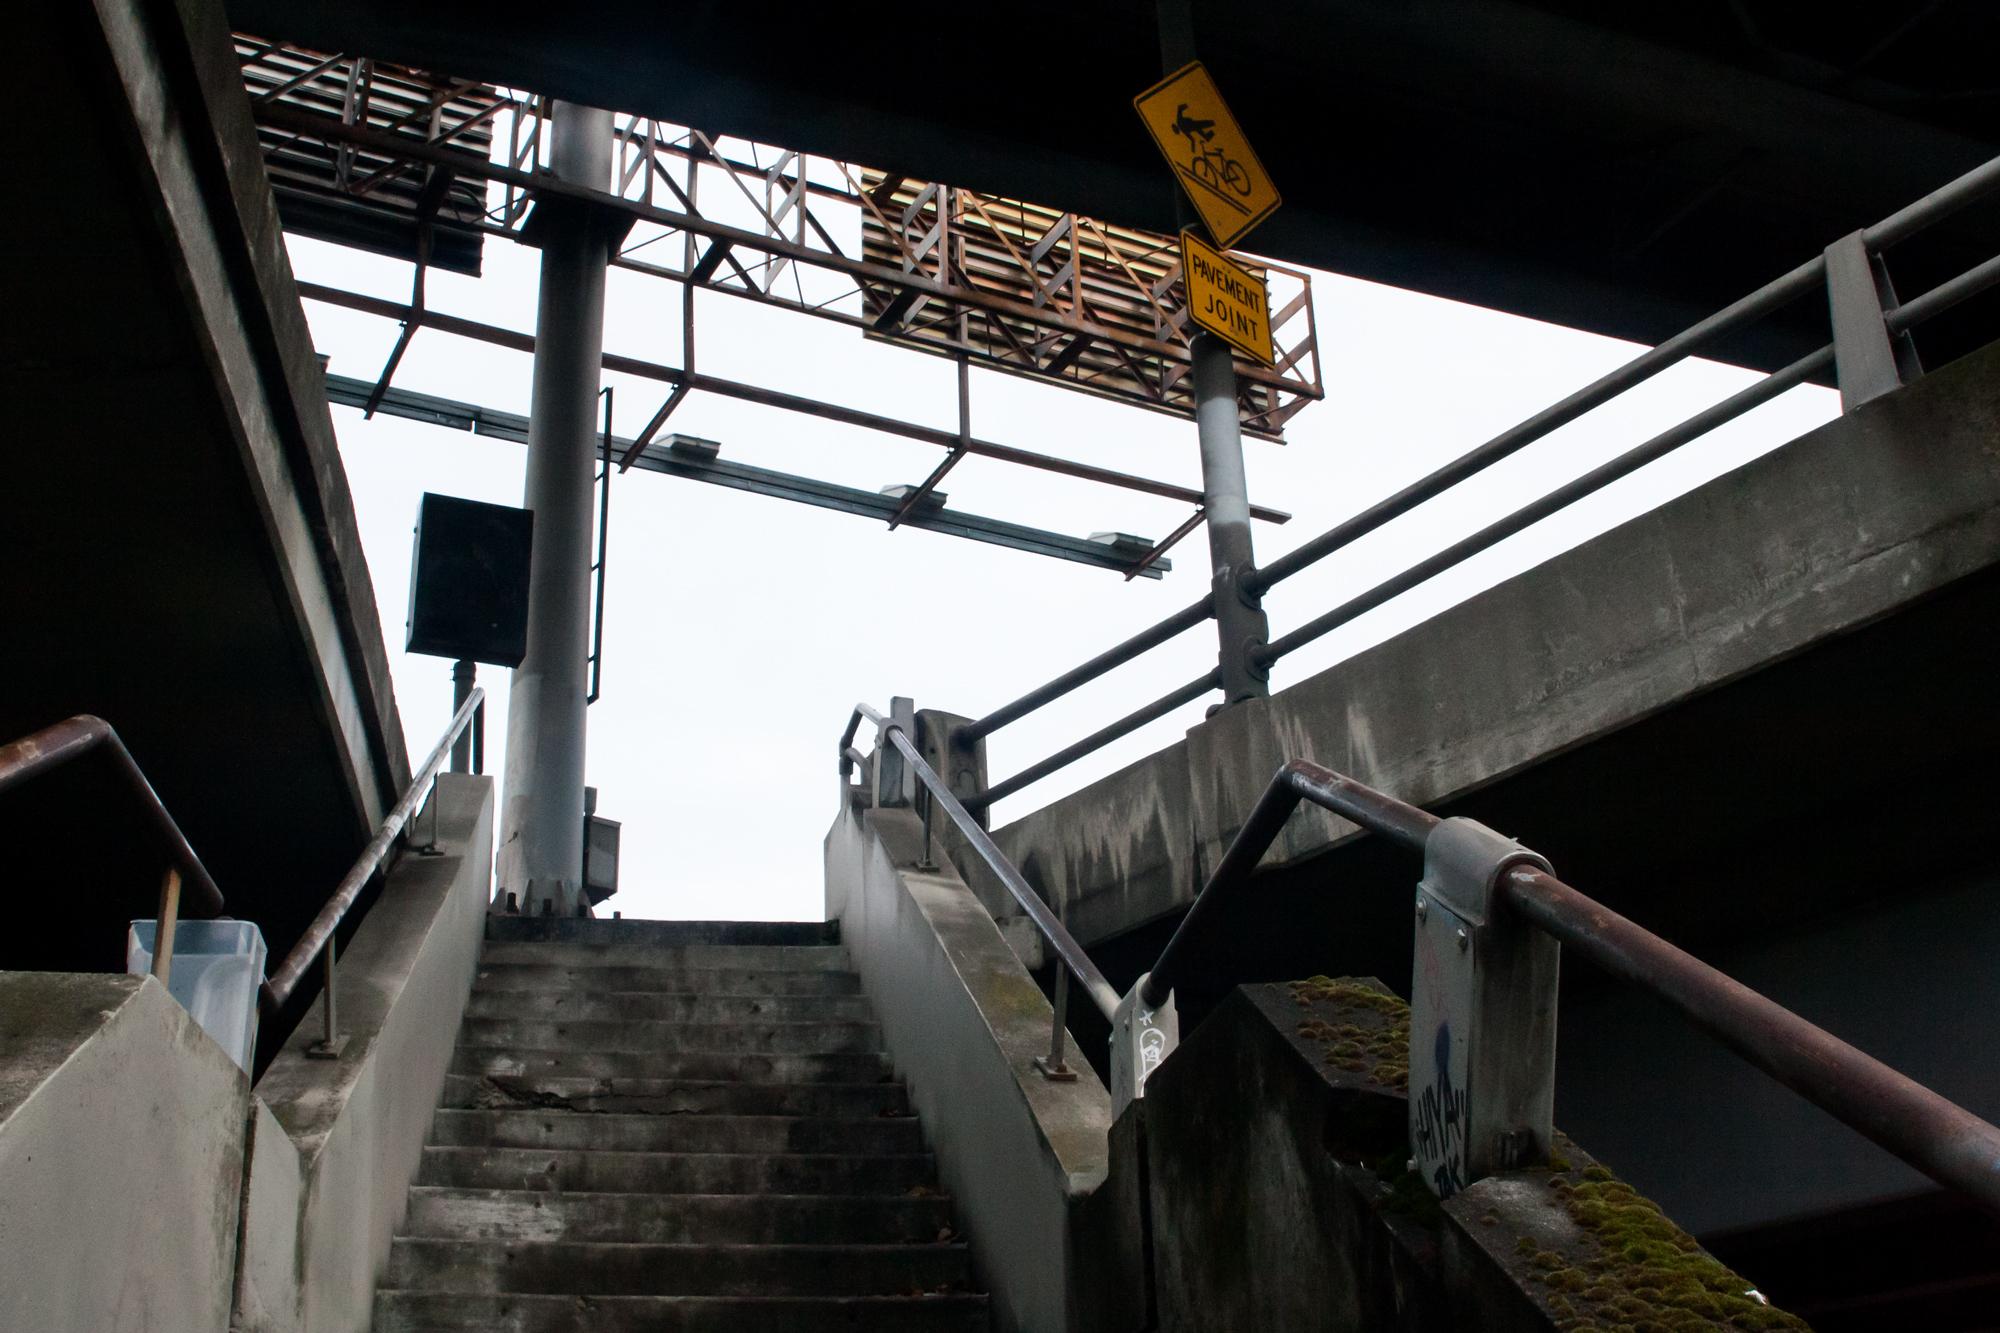 stairs-under-the-morrison-bridge-web-.jpg